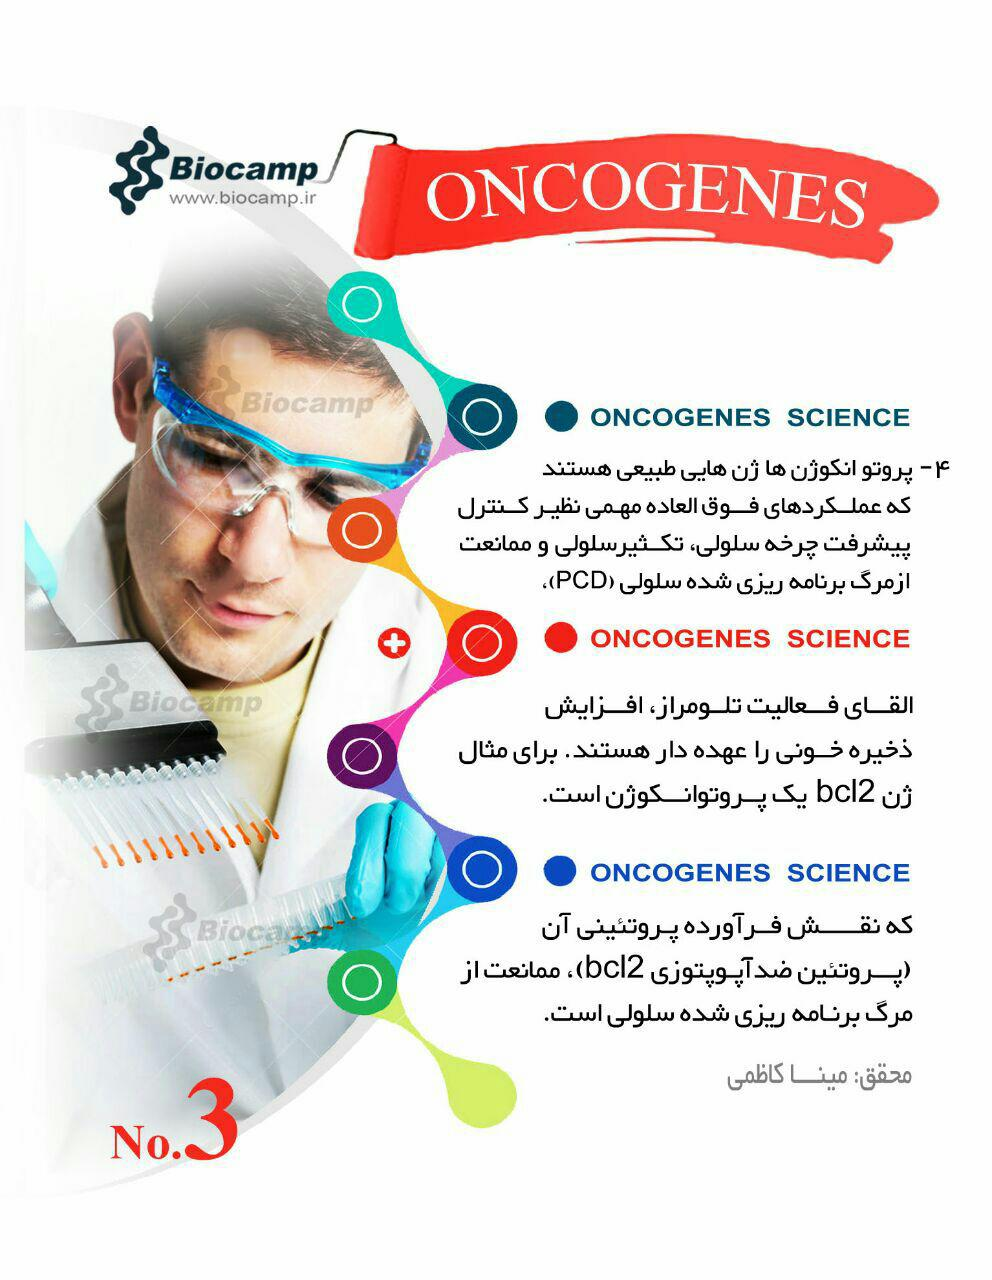 انکوژن انکوژن چیست؟ اینفوگرافی انکوژن چیست؟ اینفوگرافی photo 2016 09 12 21 16 13